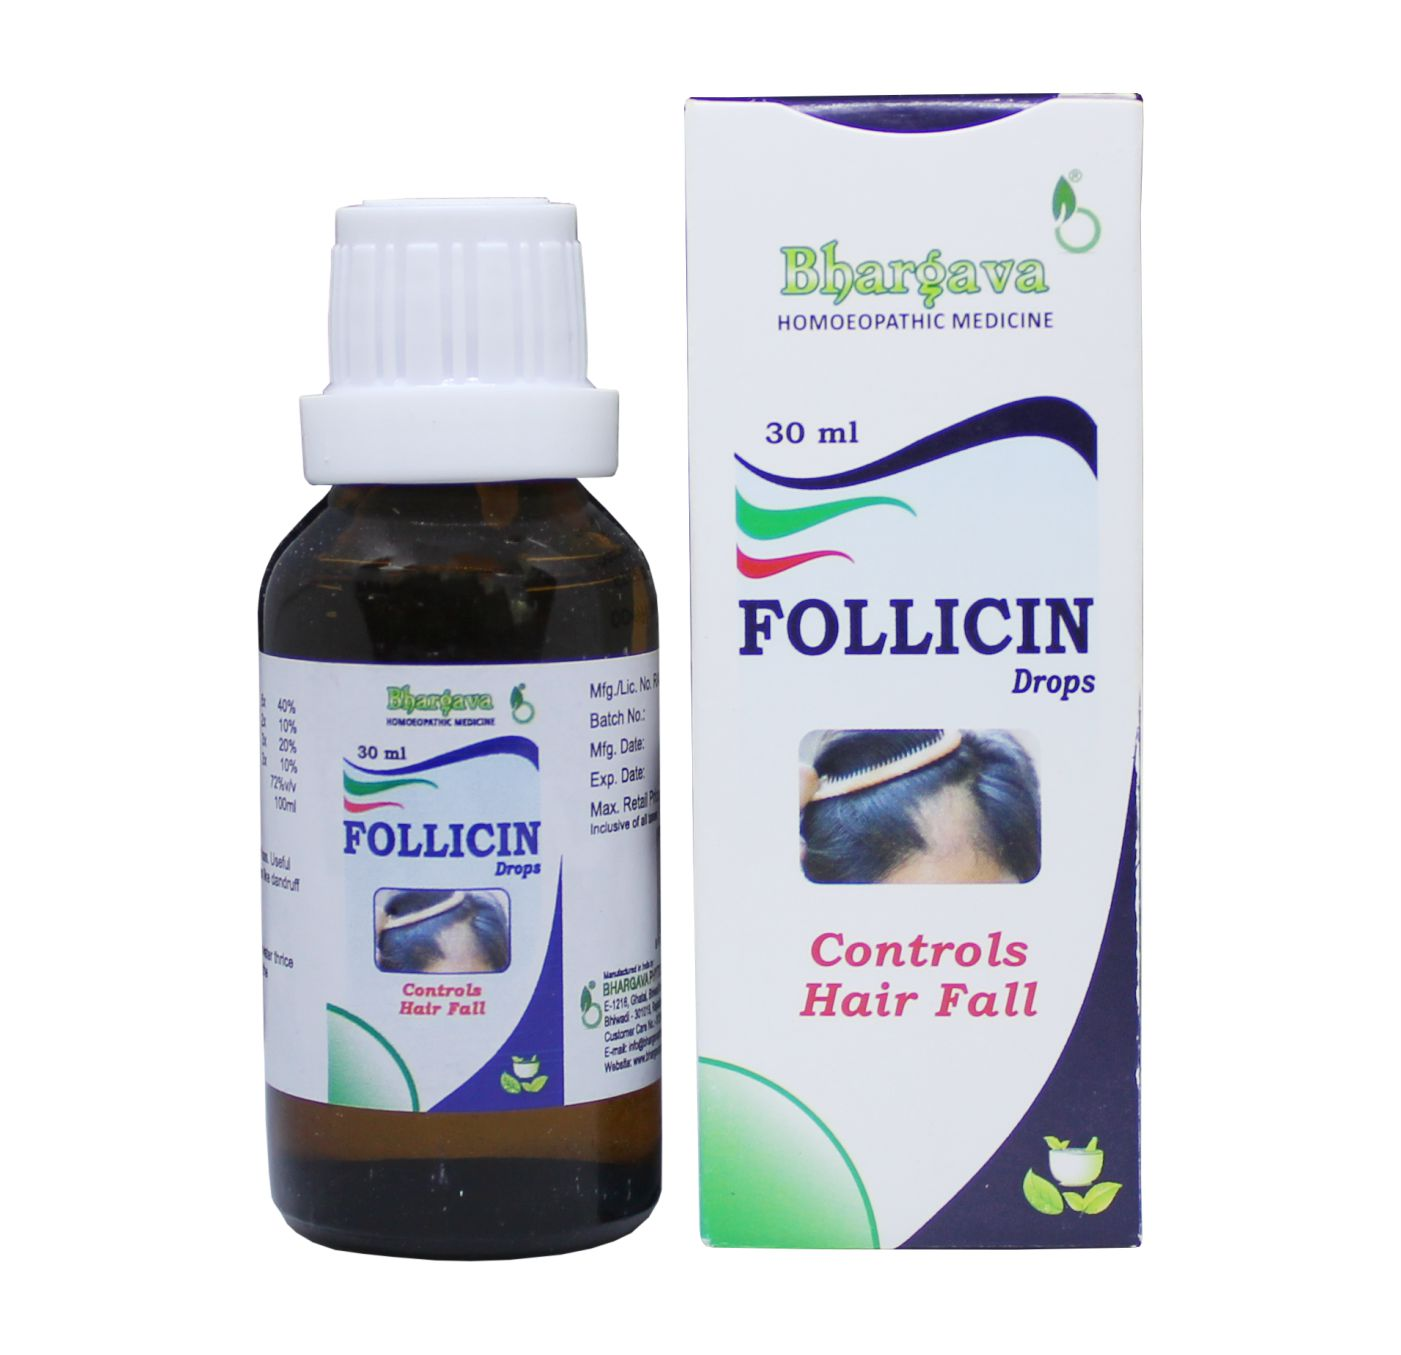 Follicin Drops Homeopathic Medicine style=